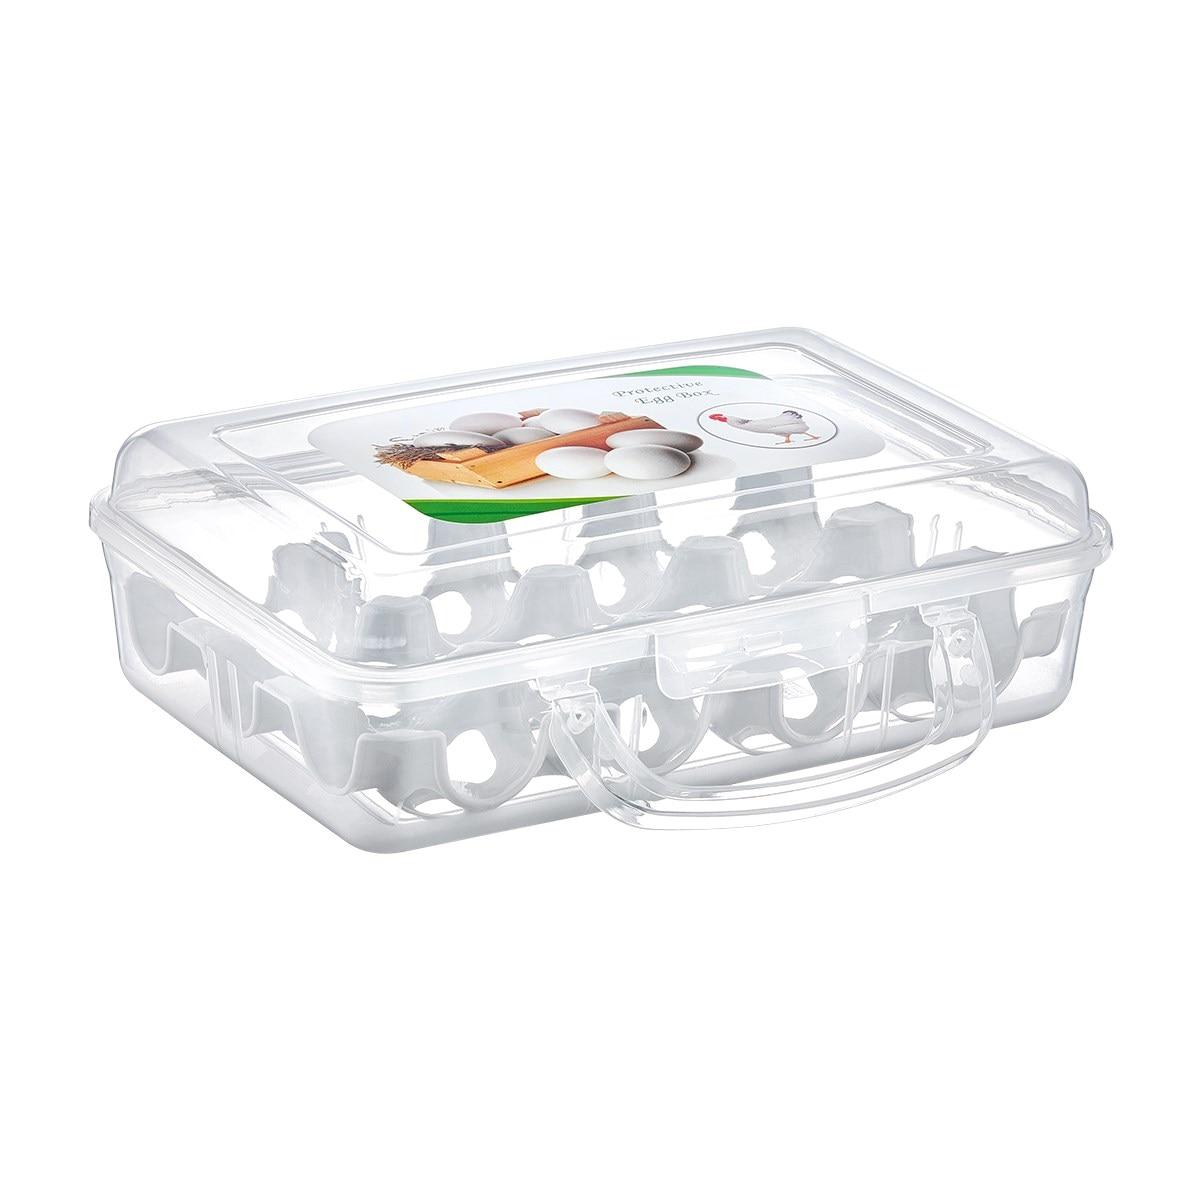 Bolsa de transporte de huevos con asa de plástico Juego de 2 huevos